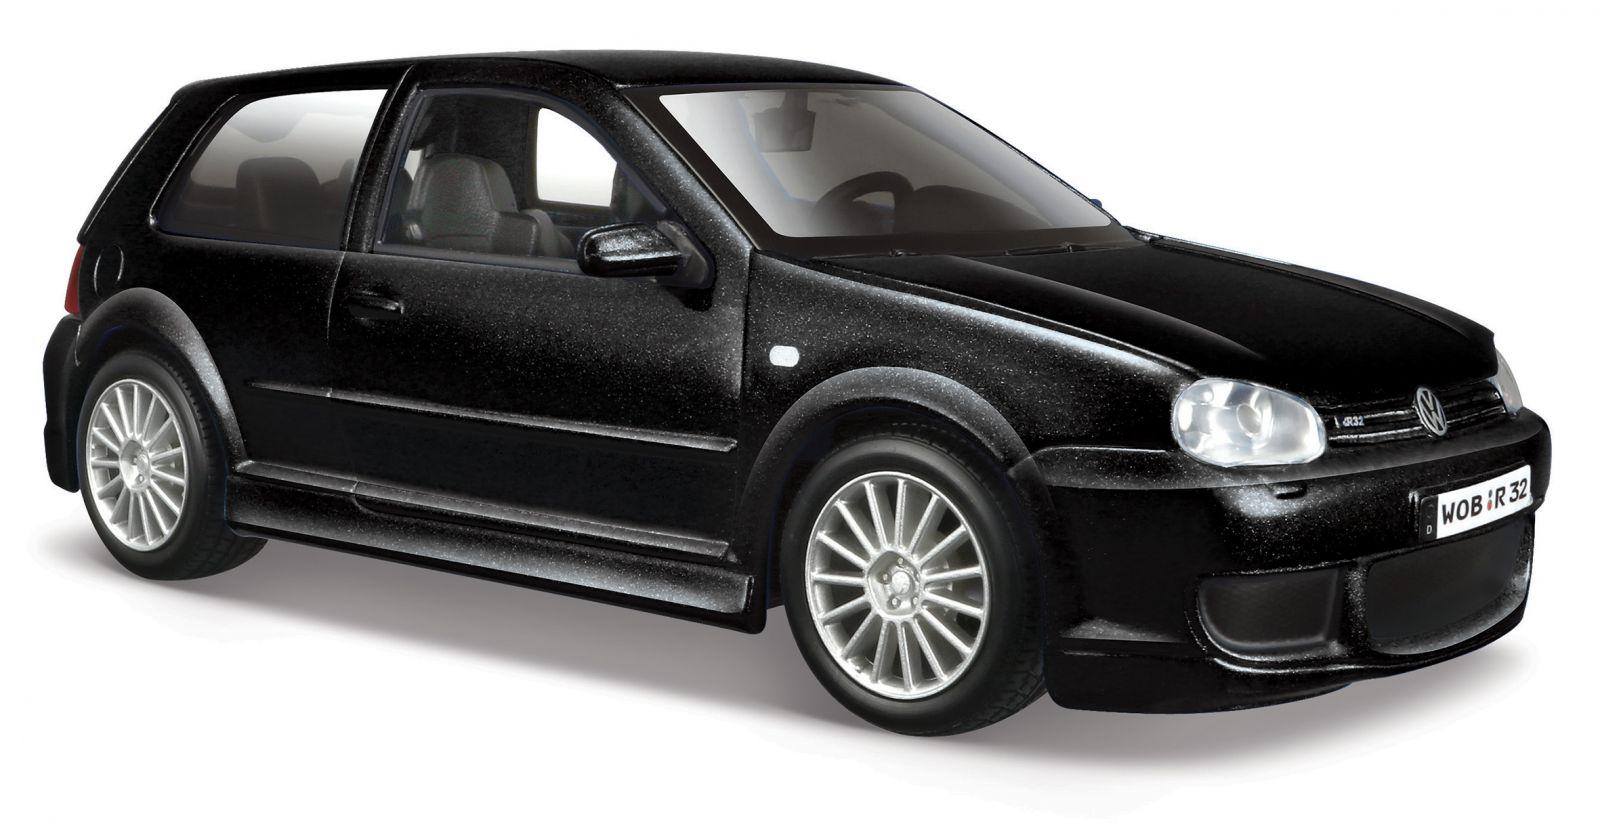 Maisto 1:24 Volkswagen Golf R32 31290 - černá barva